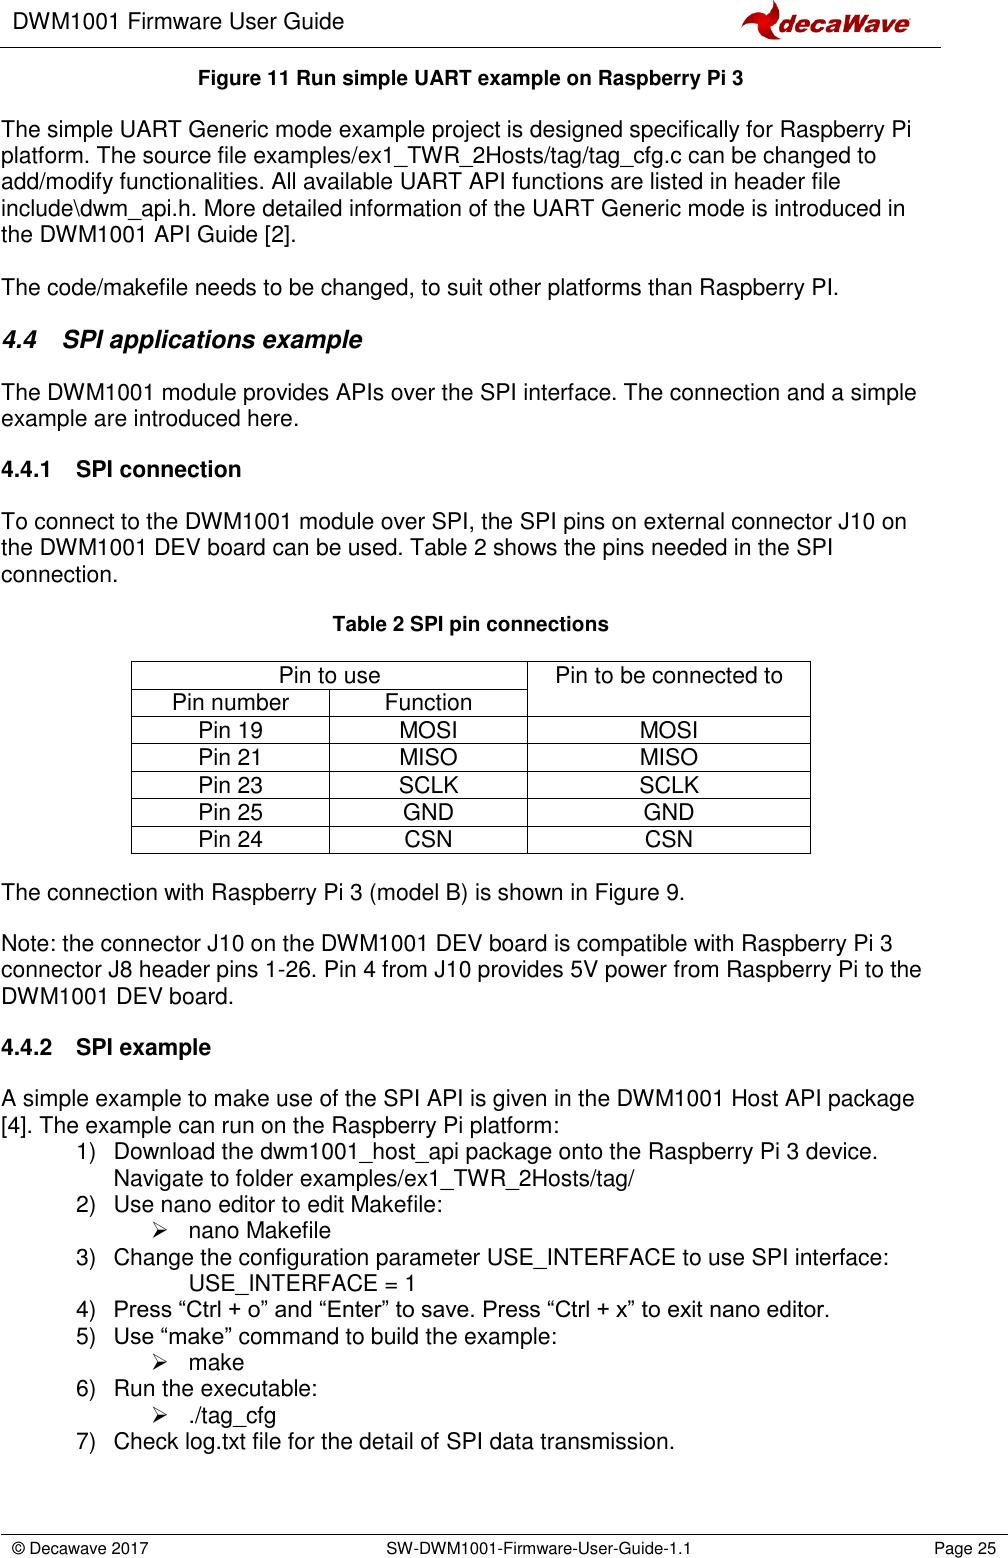 DWM1001 Firmware User Guide Ver11